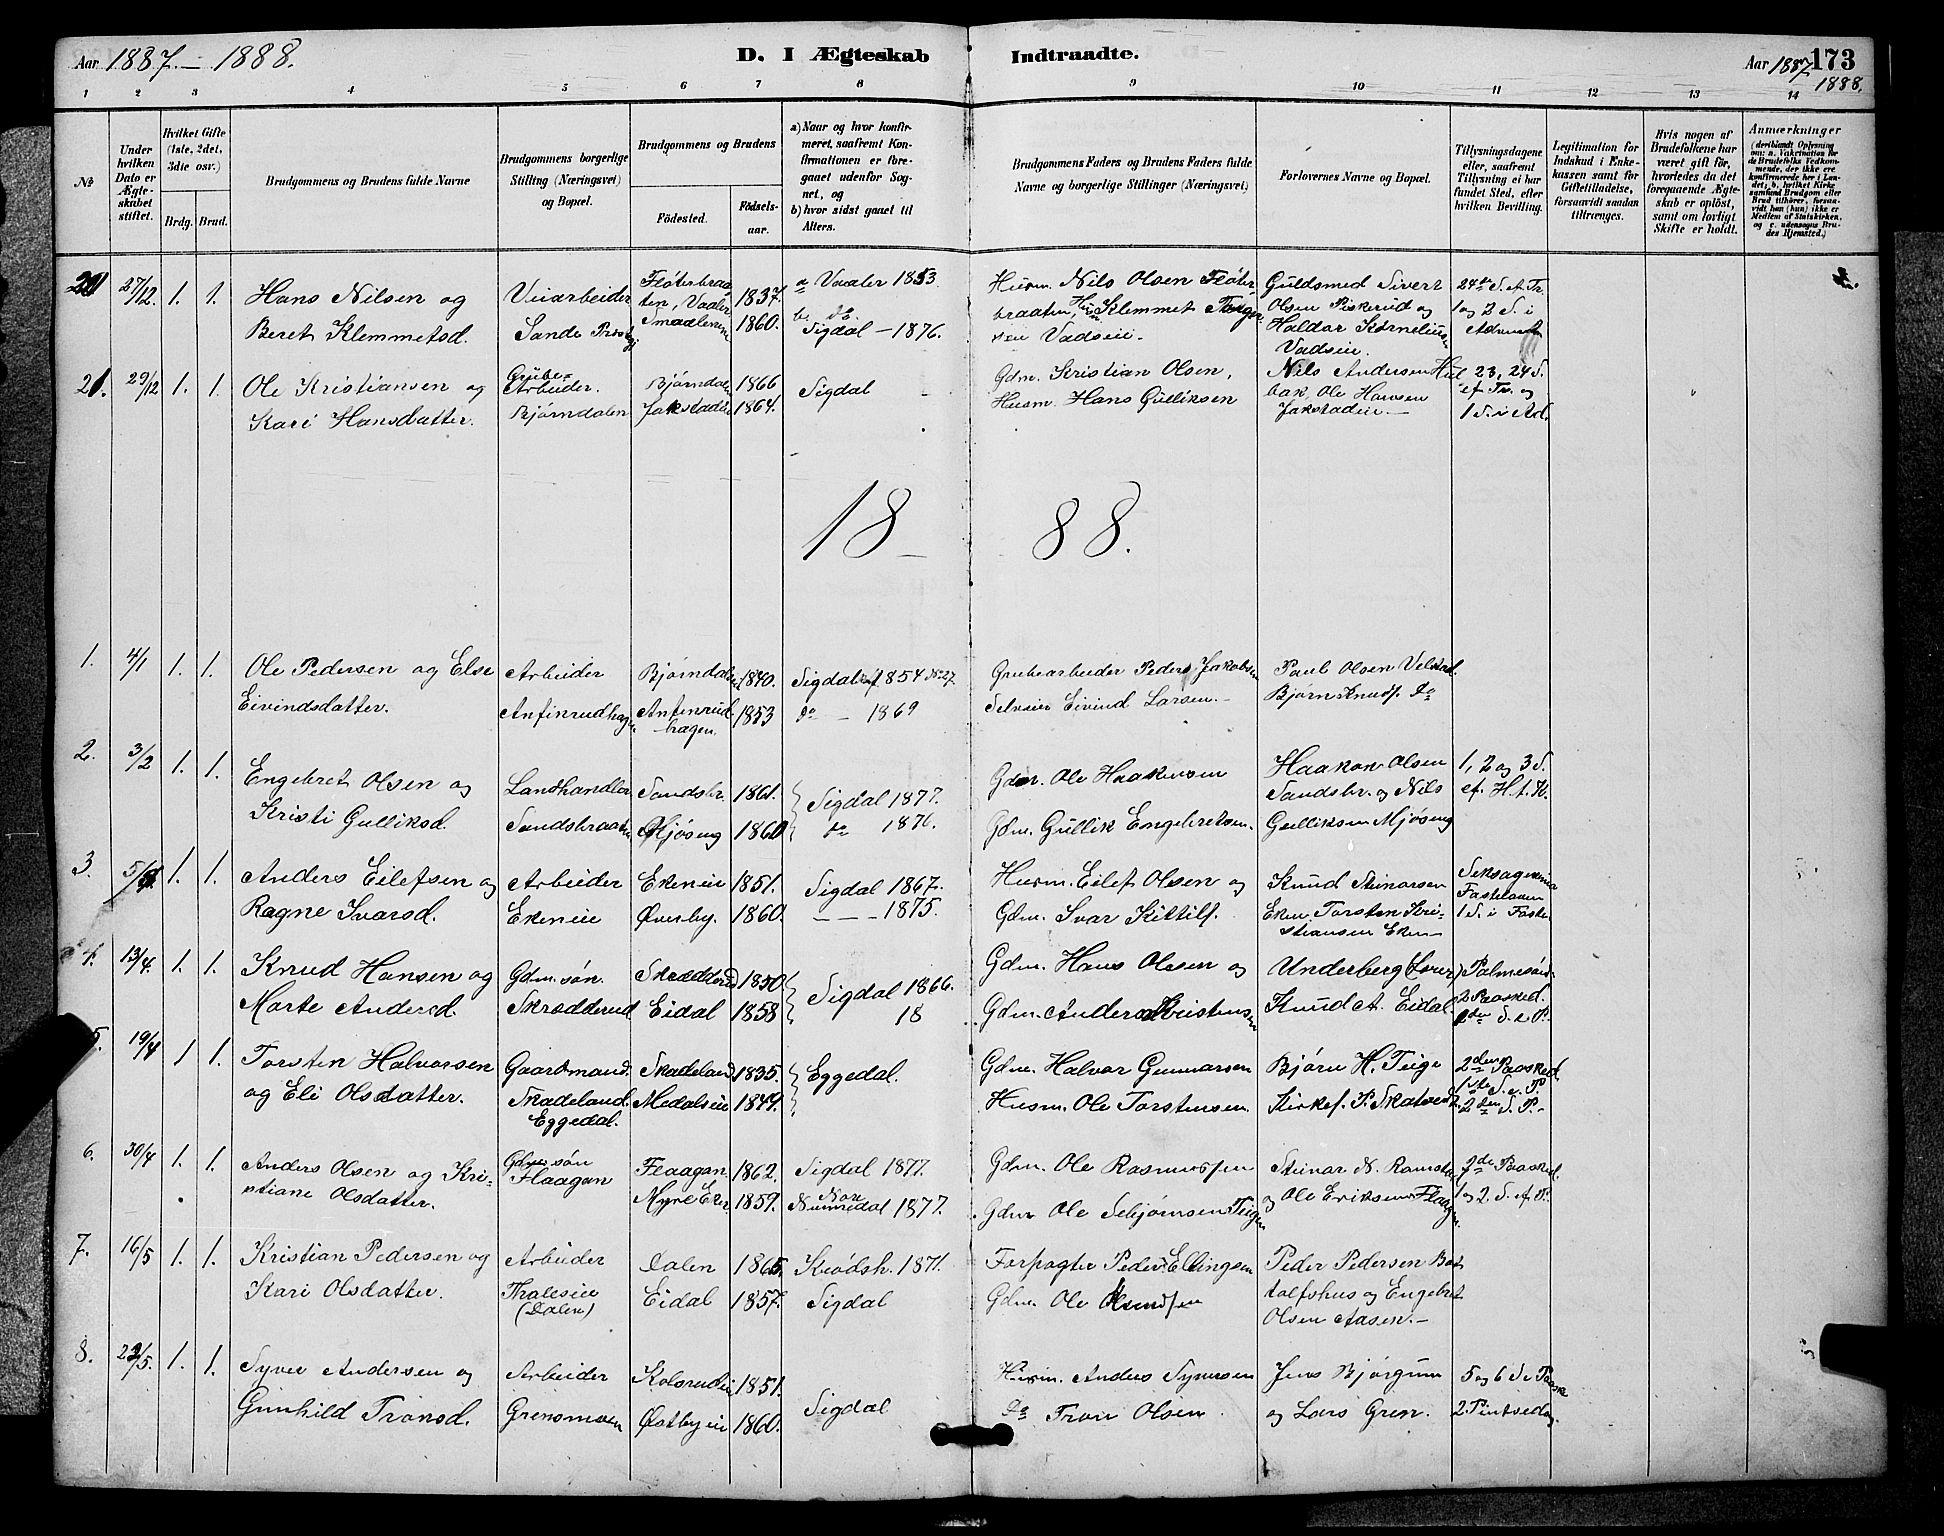 SAKO, Sigdal kirkebøker, G/Ga/L0005: Klokkerbok nr. I 5, 1886-1900, s. 173